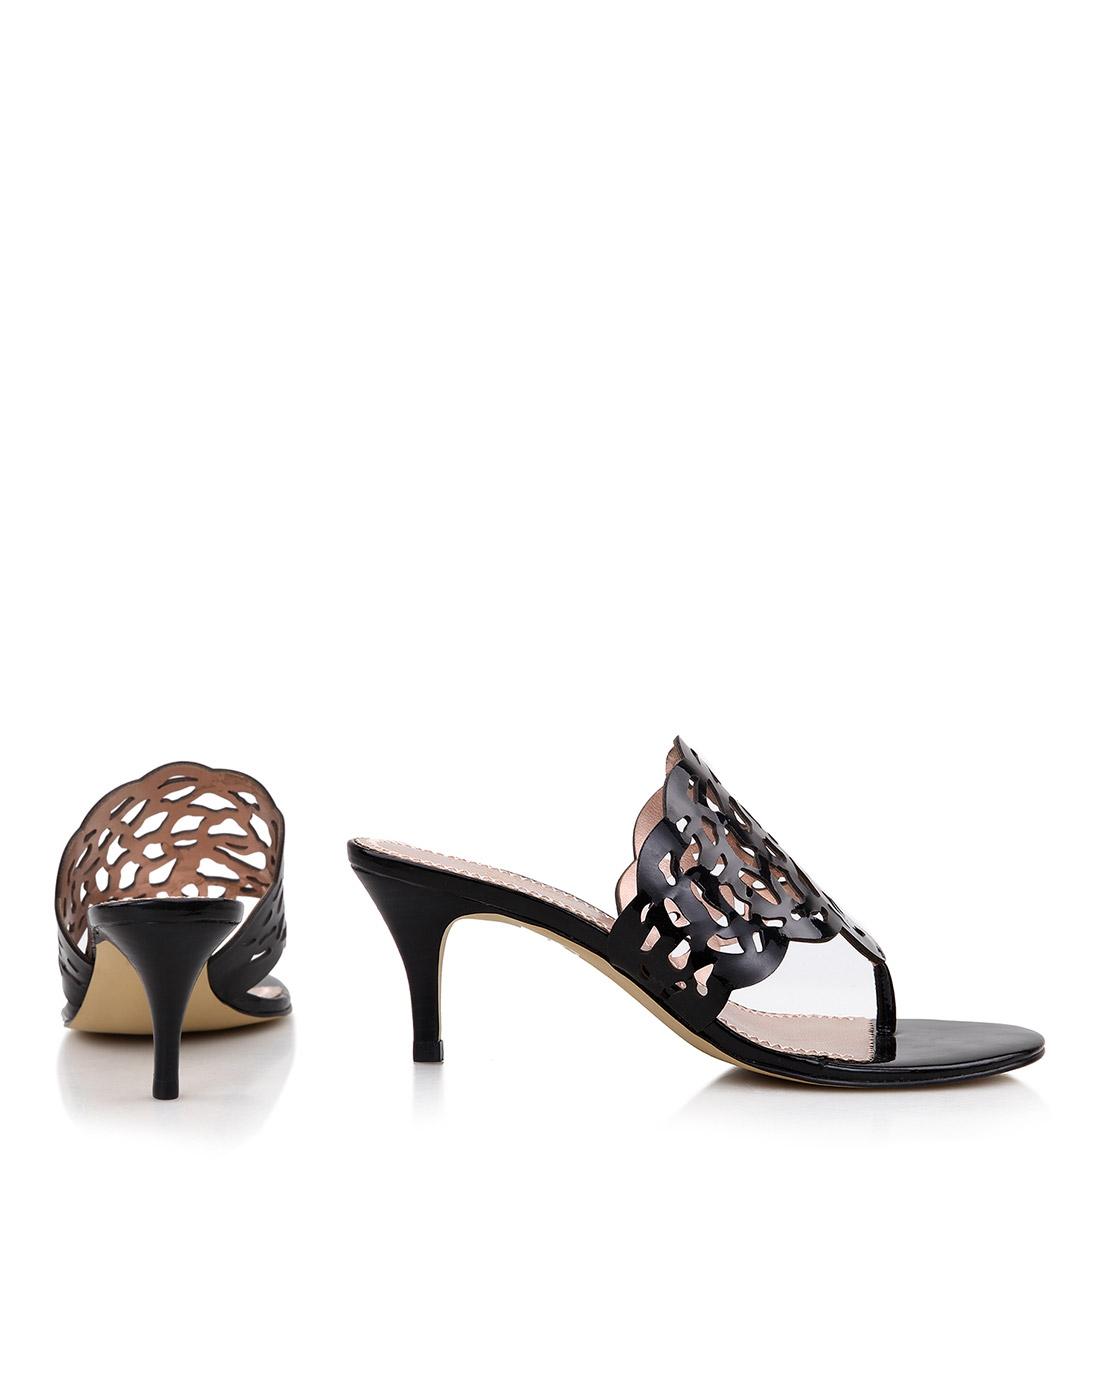 jcc 黑色镜面羊皮镂空花纹凉鞋